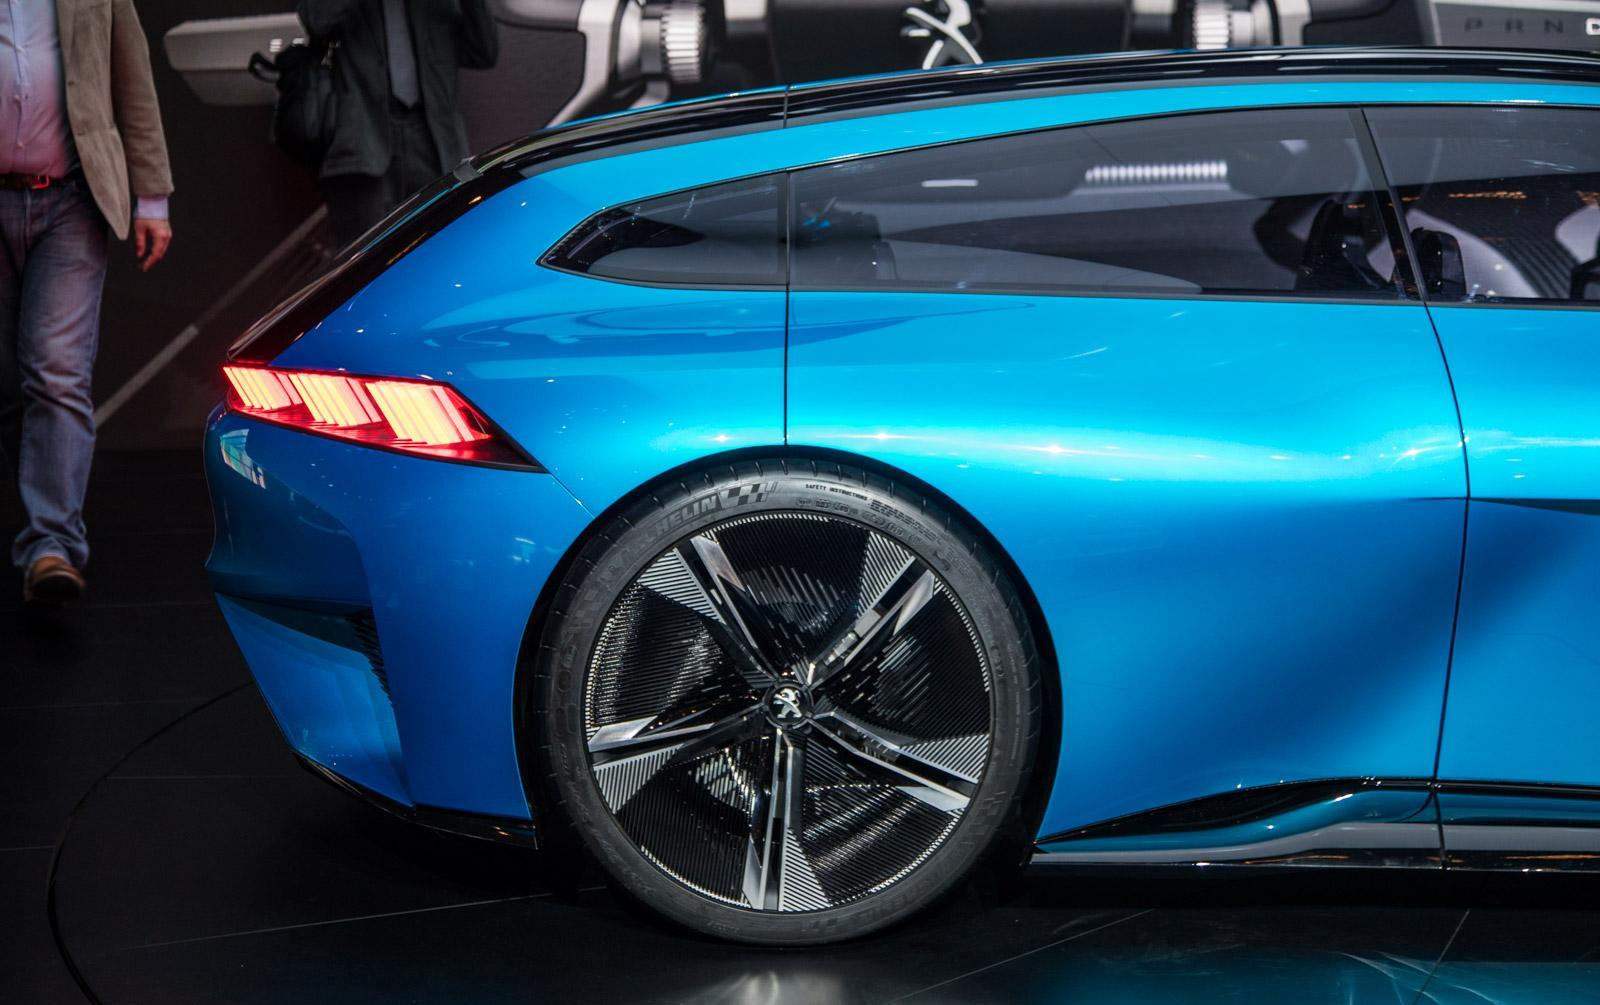 Peugeot-instinct-concept-020